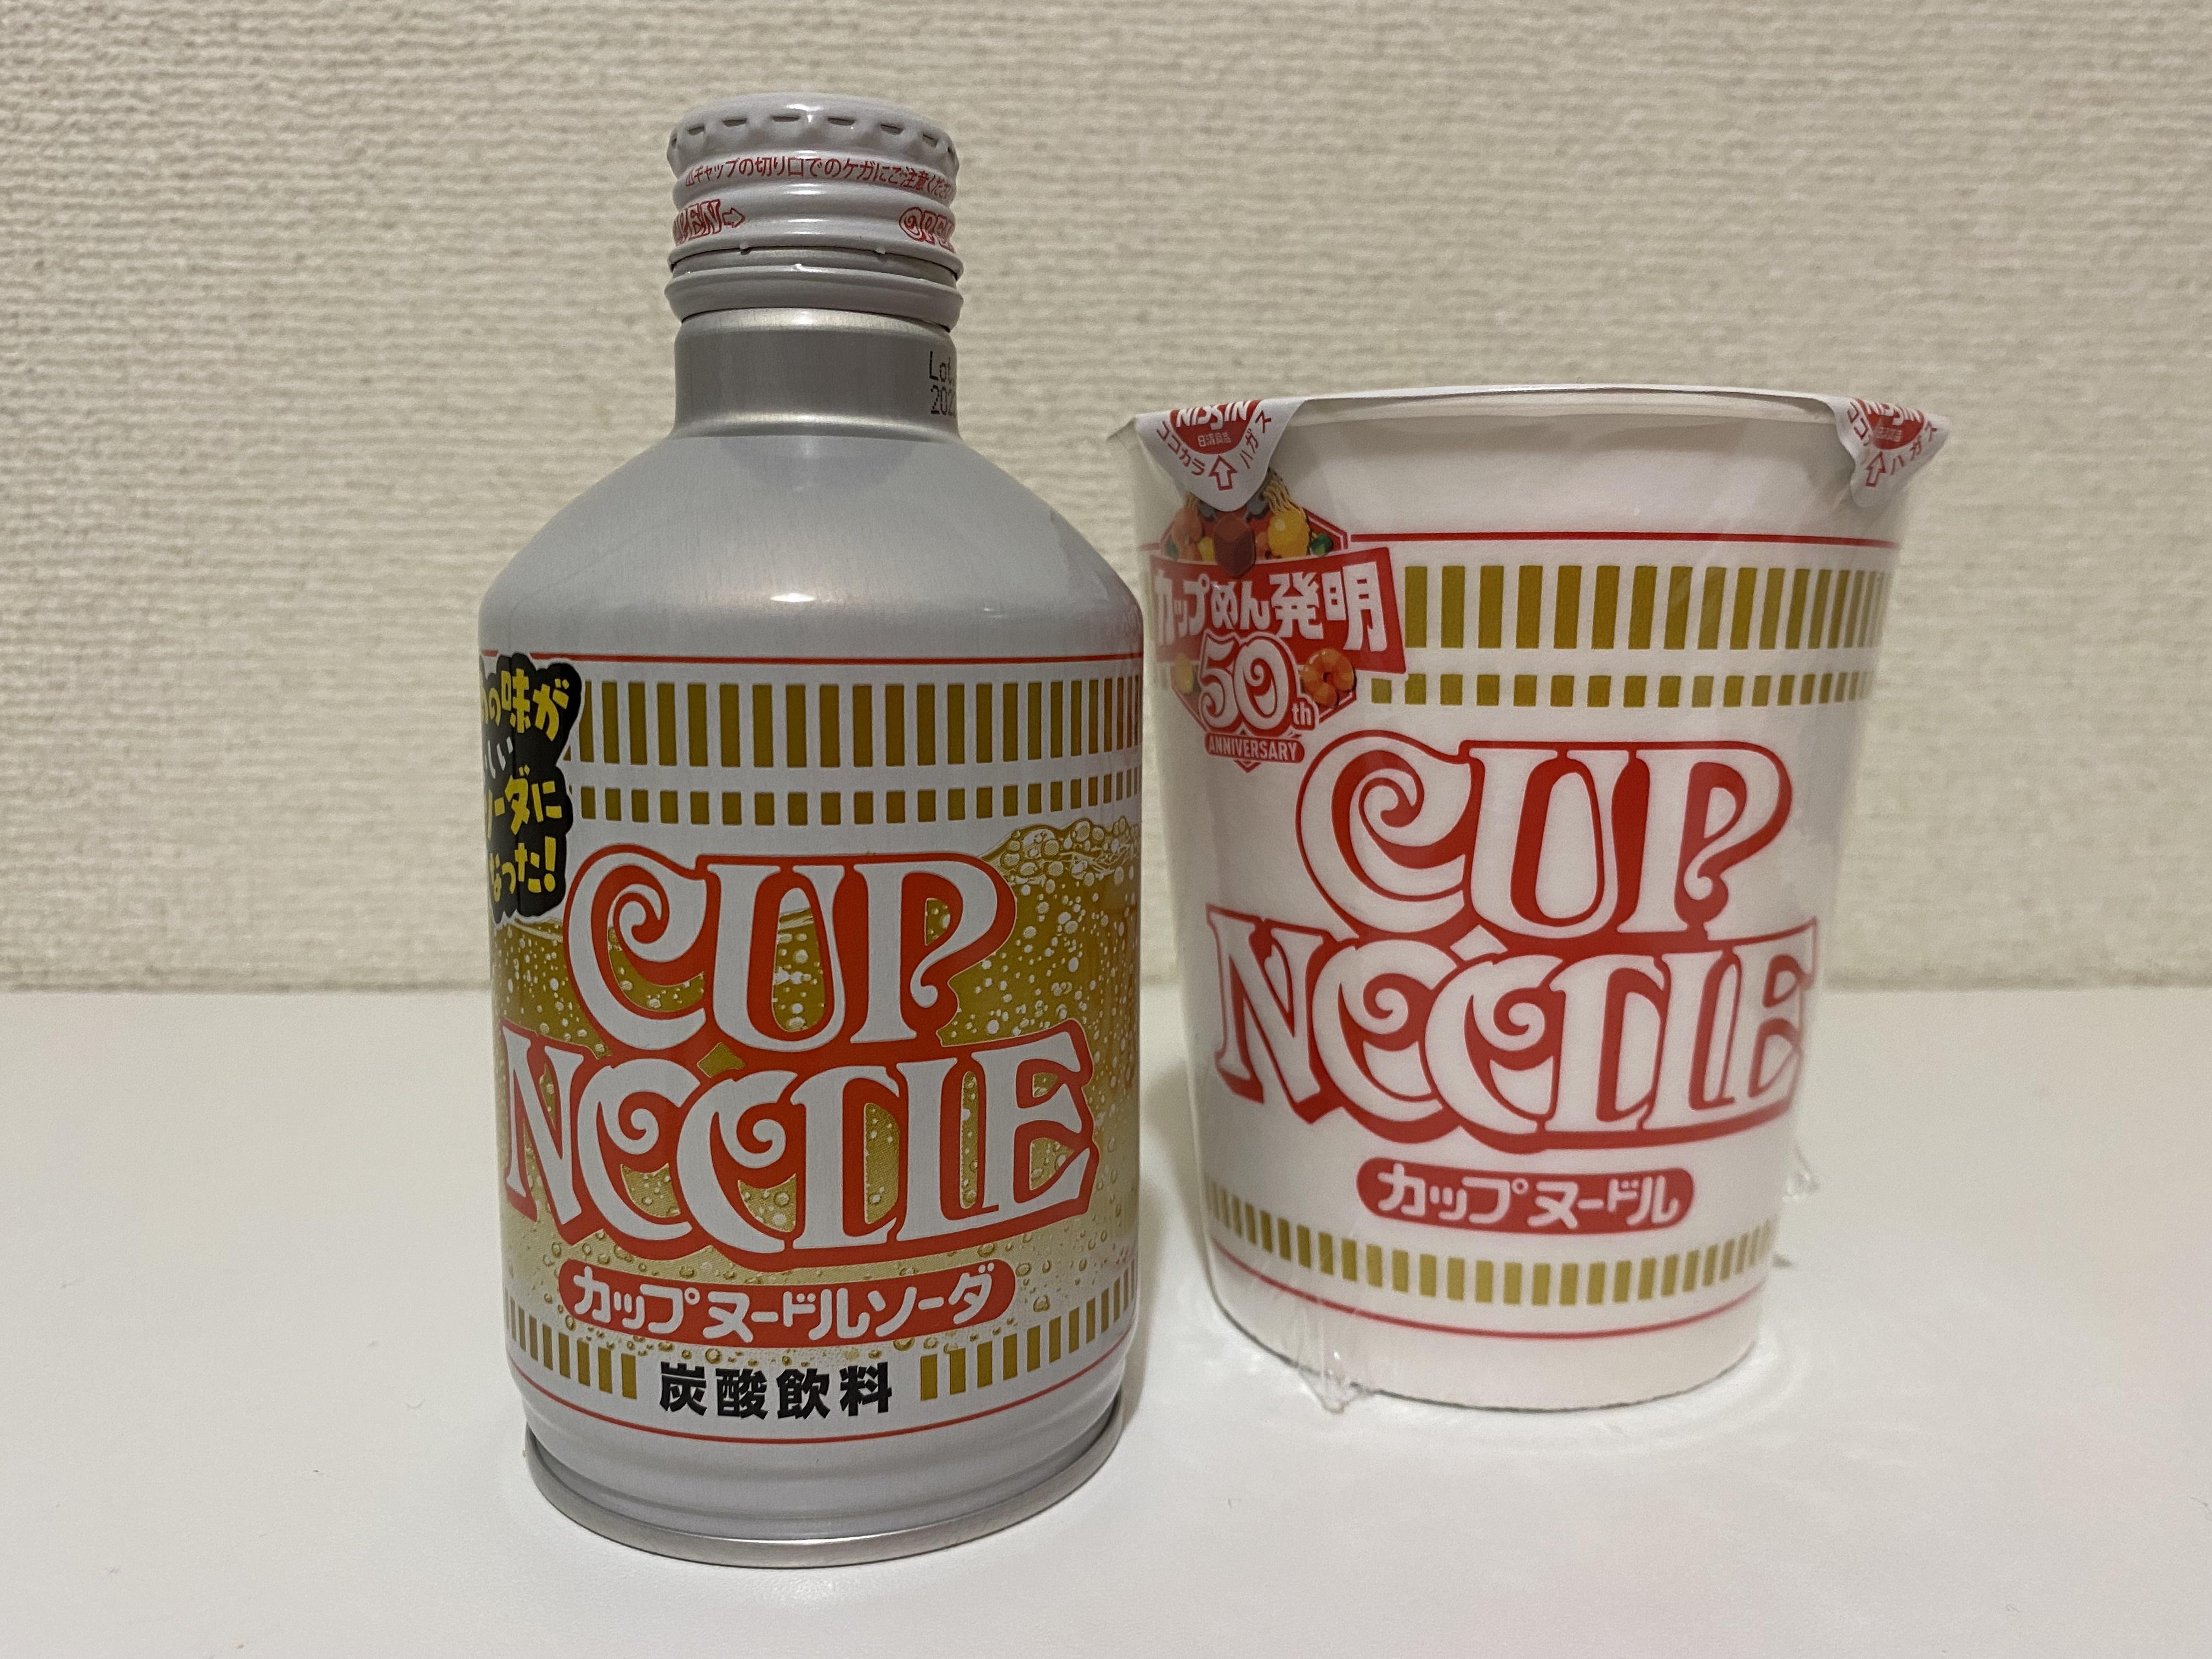 Minuman soda rasa Mi Cup Nissin Original